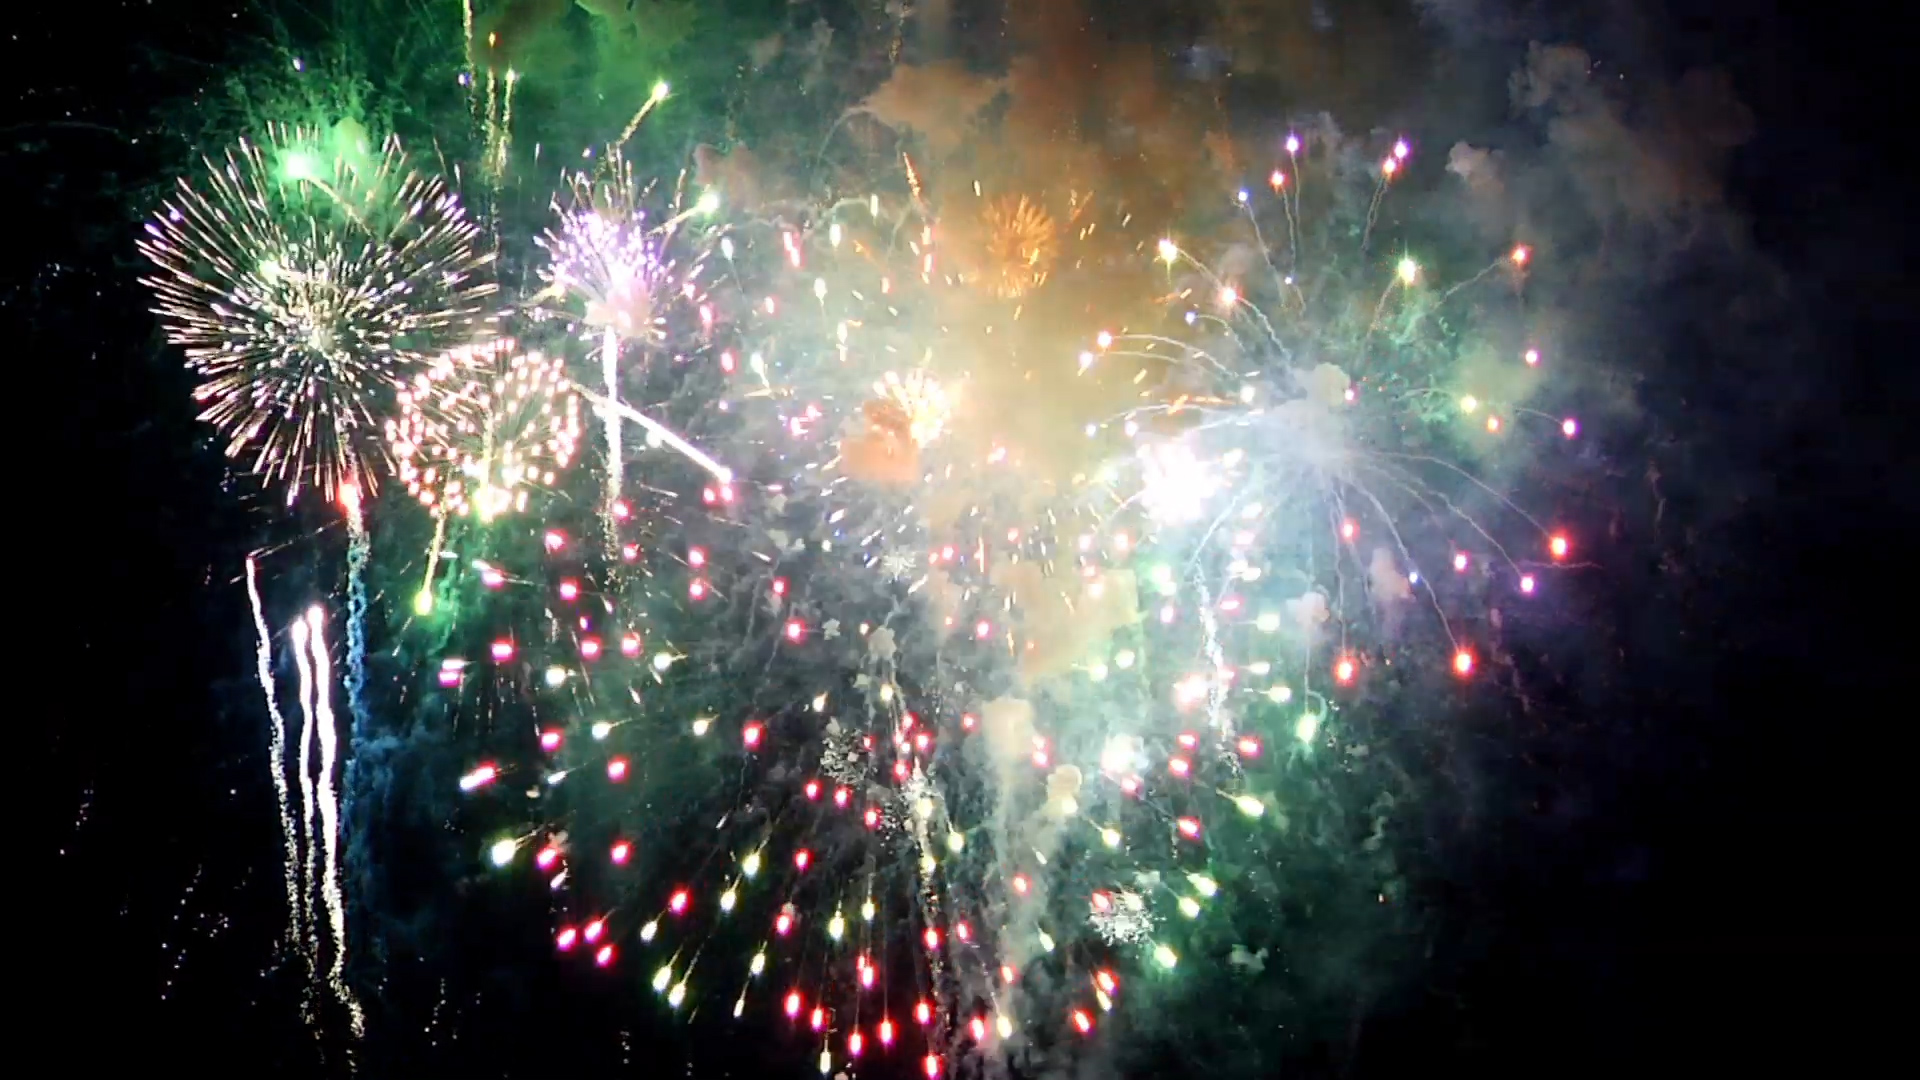 Firewworks Effect